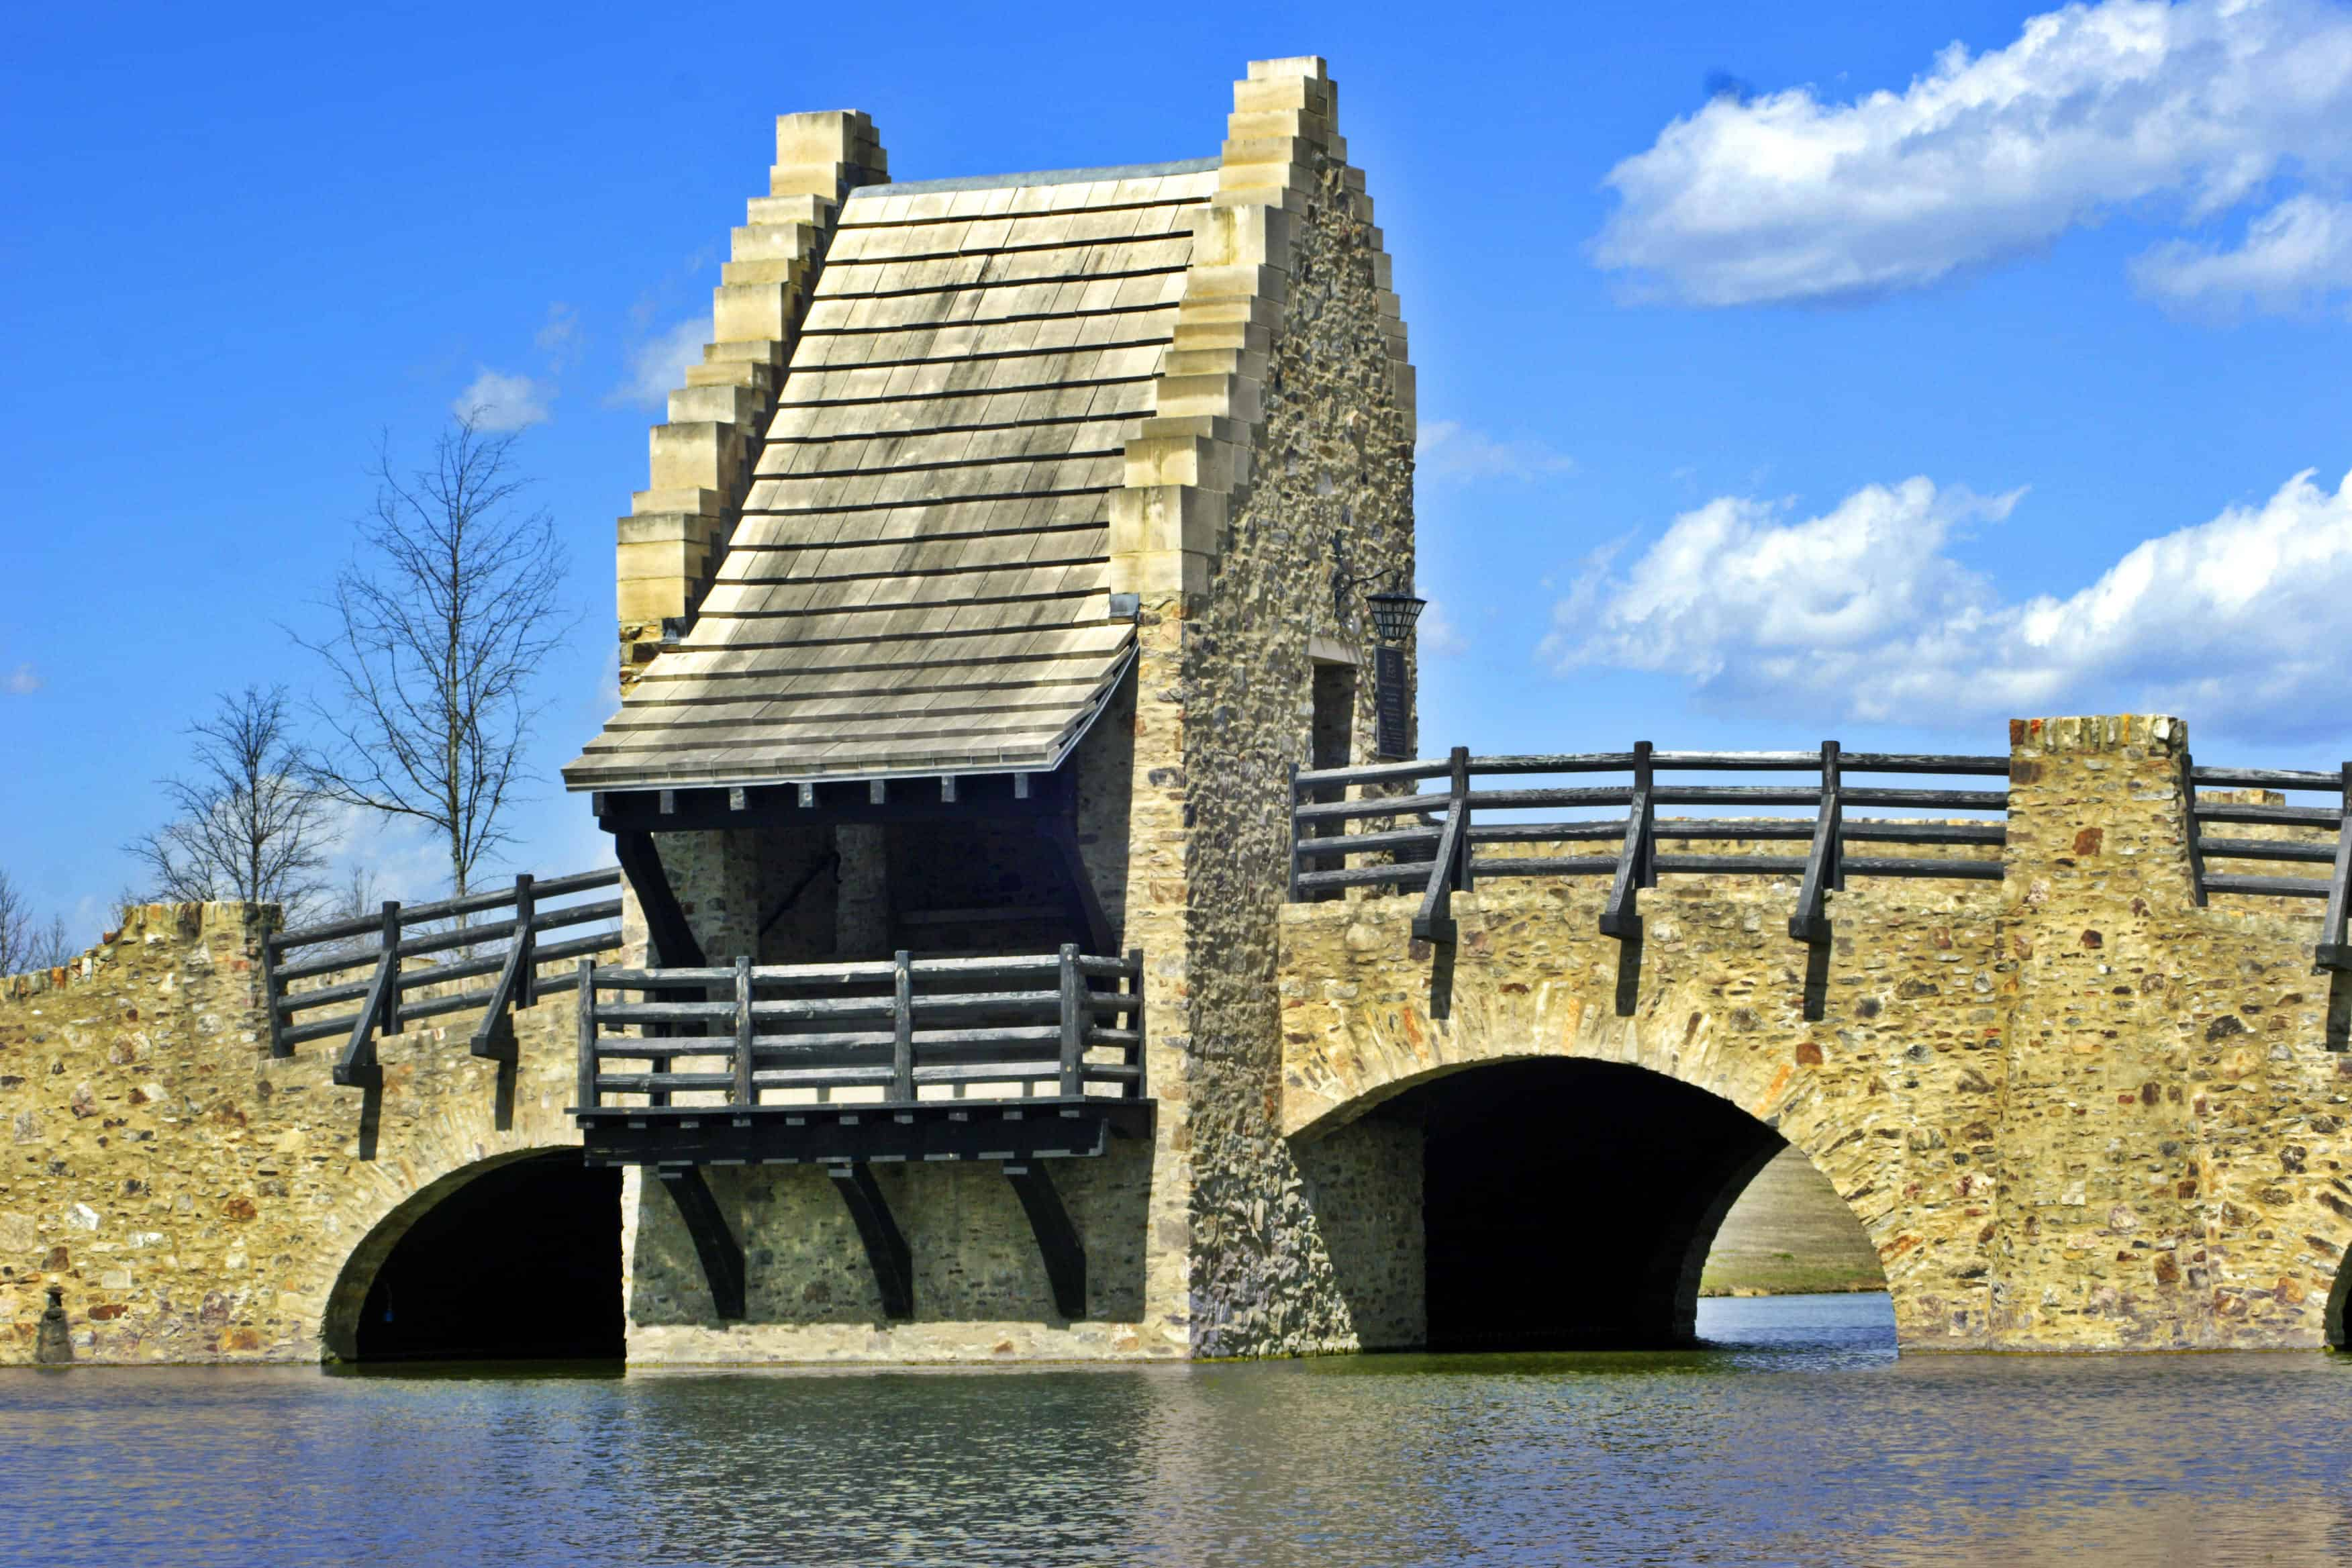 House built on a bridge